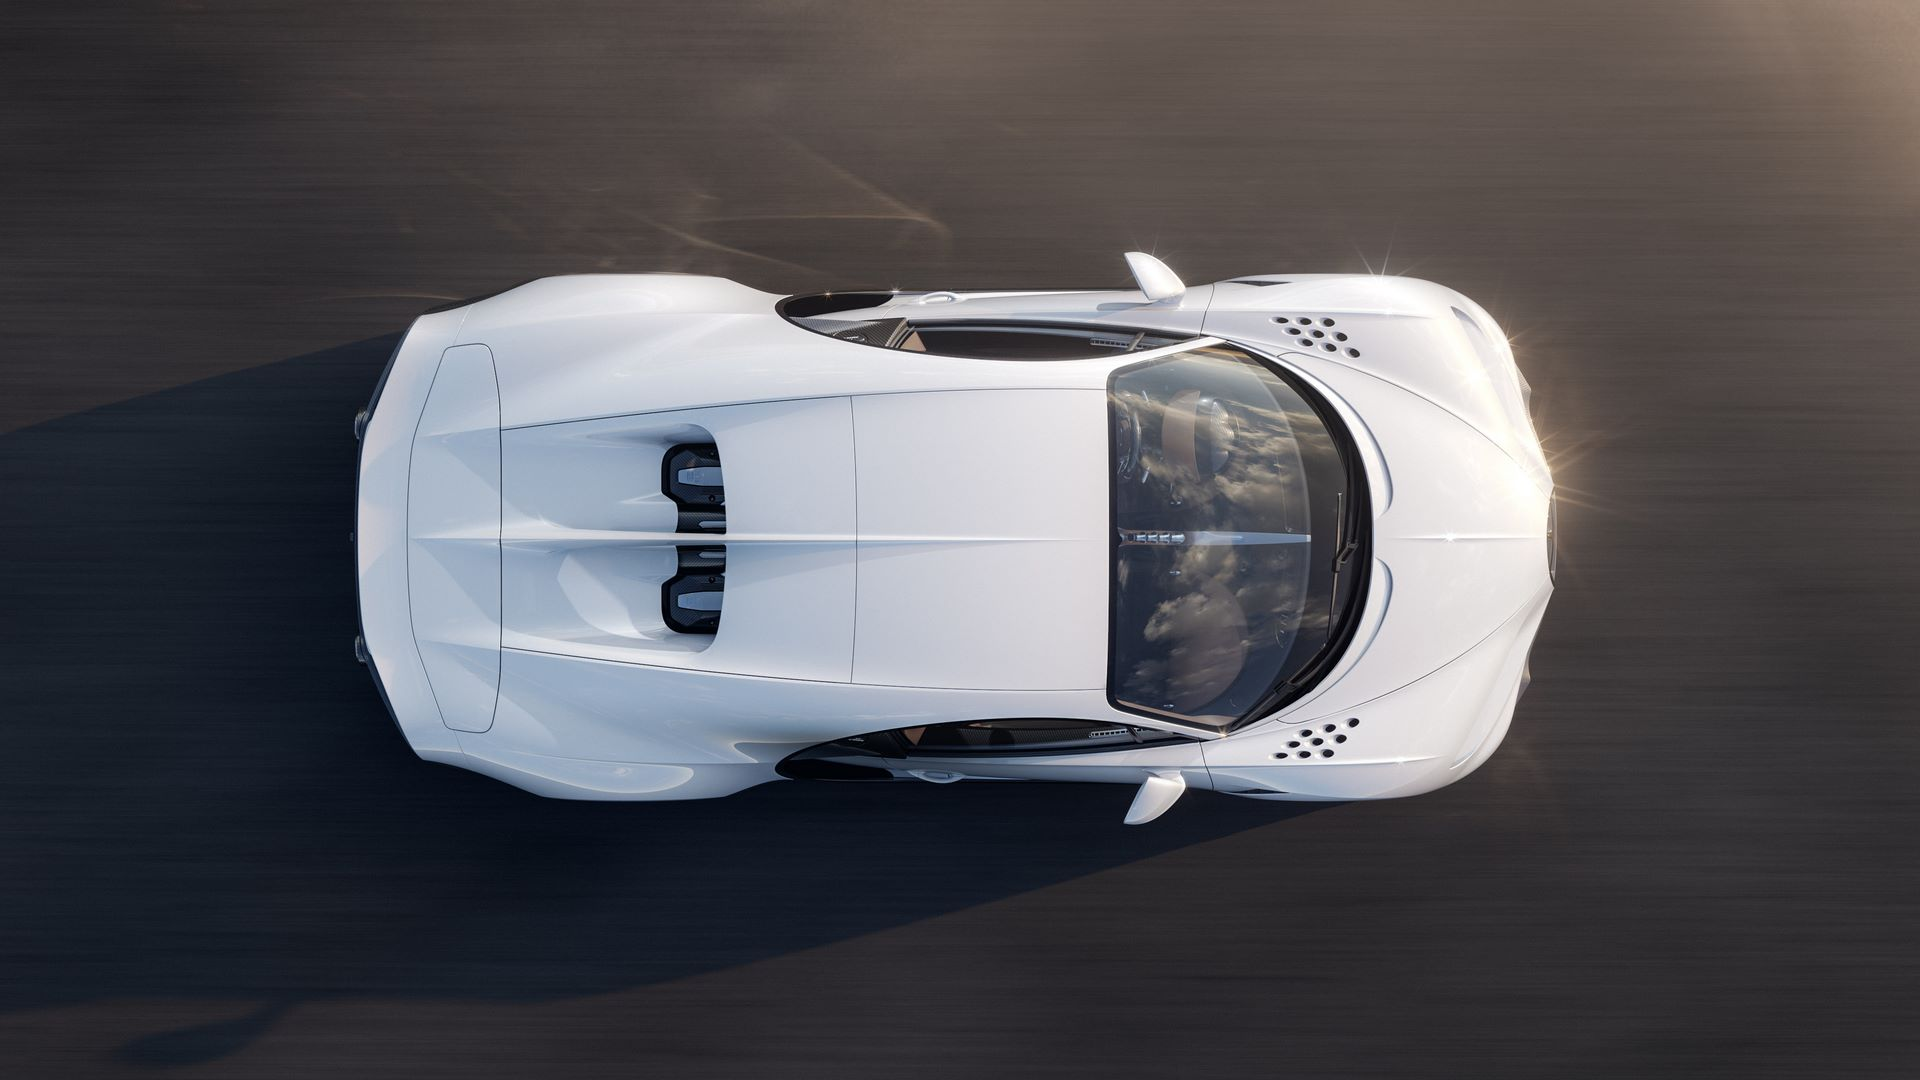 02_10_bugatti_chiron_super_sport_high_speed_top